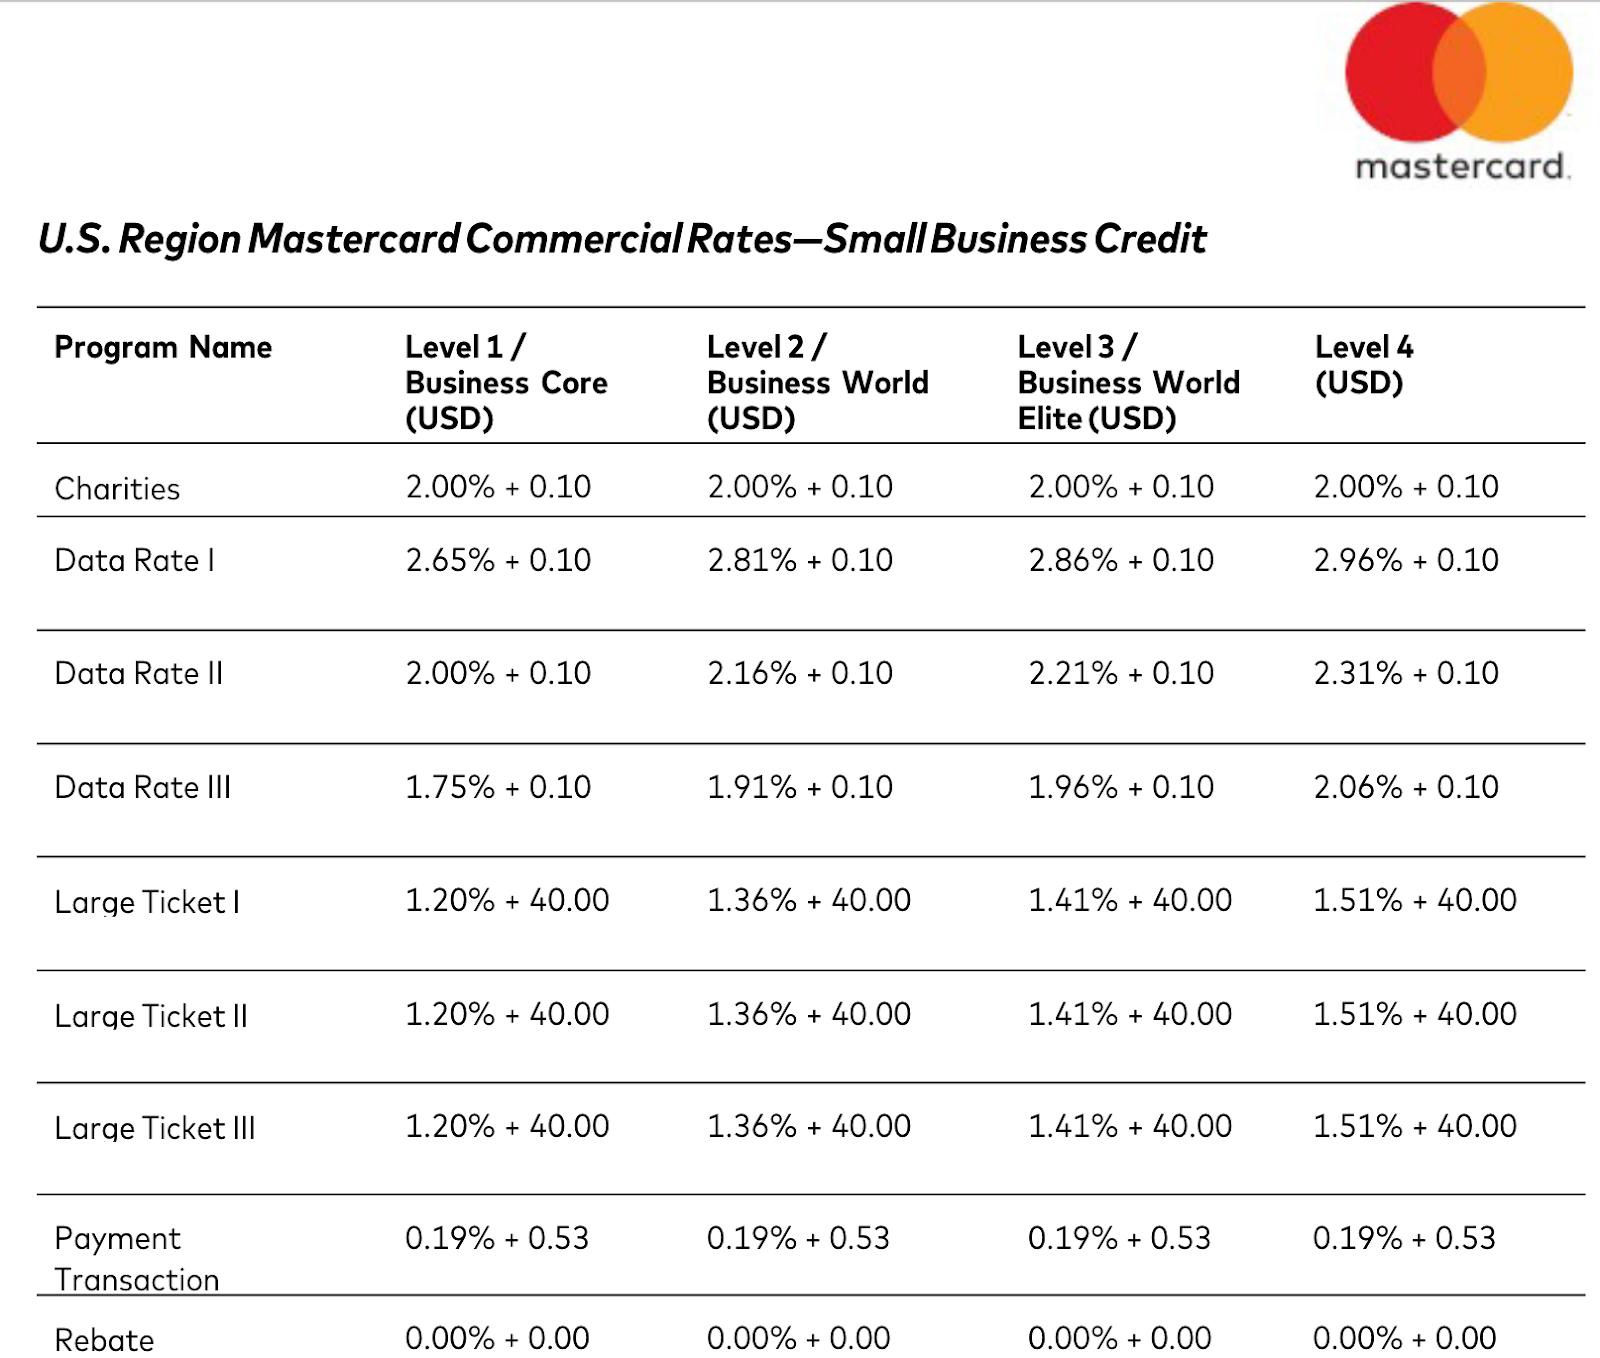 Mastercard Interchange Rates